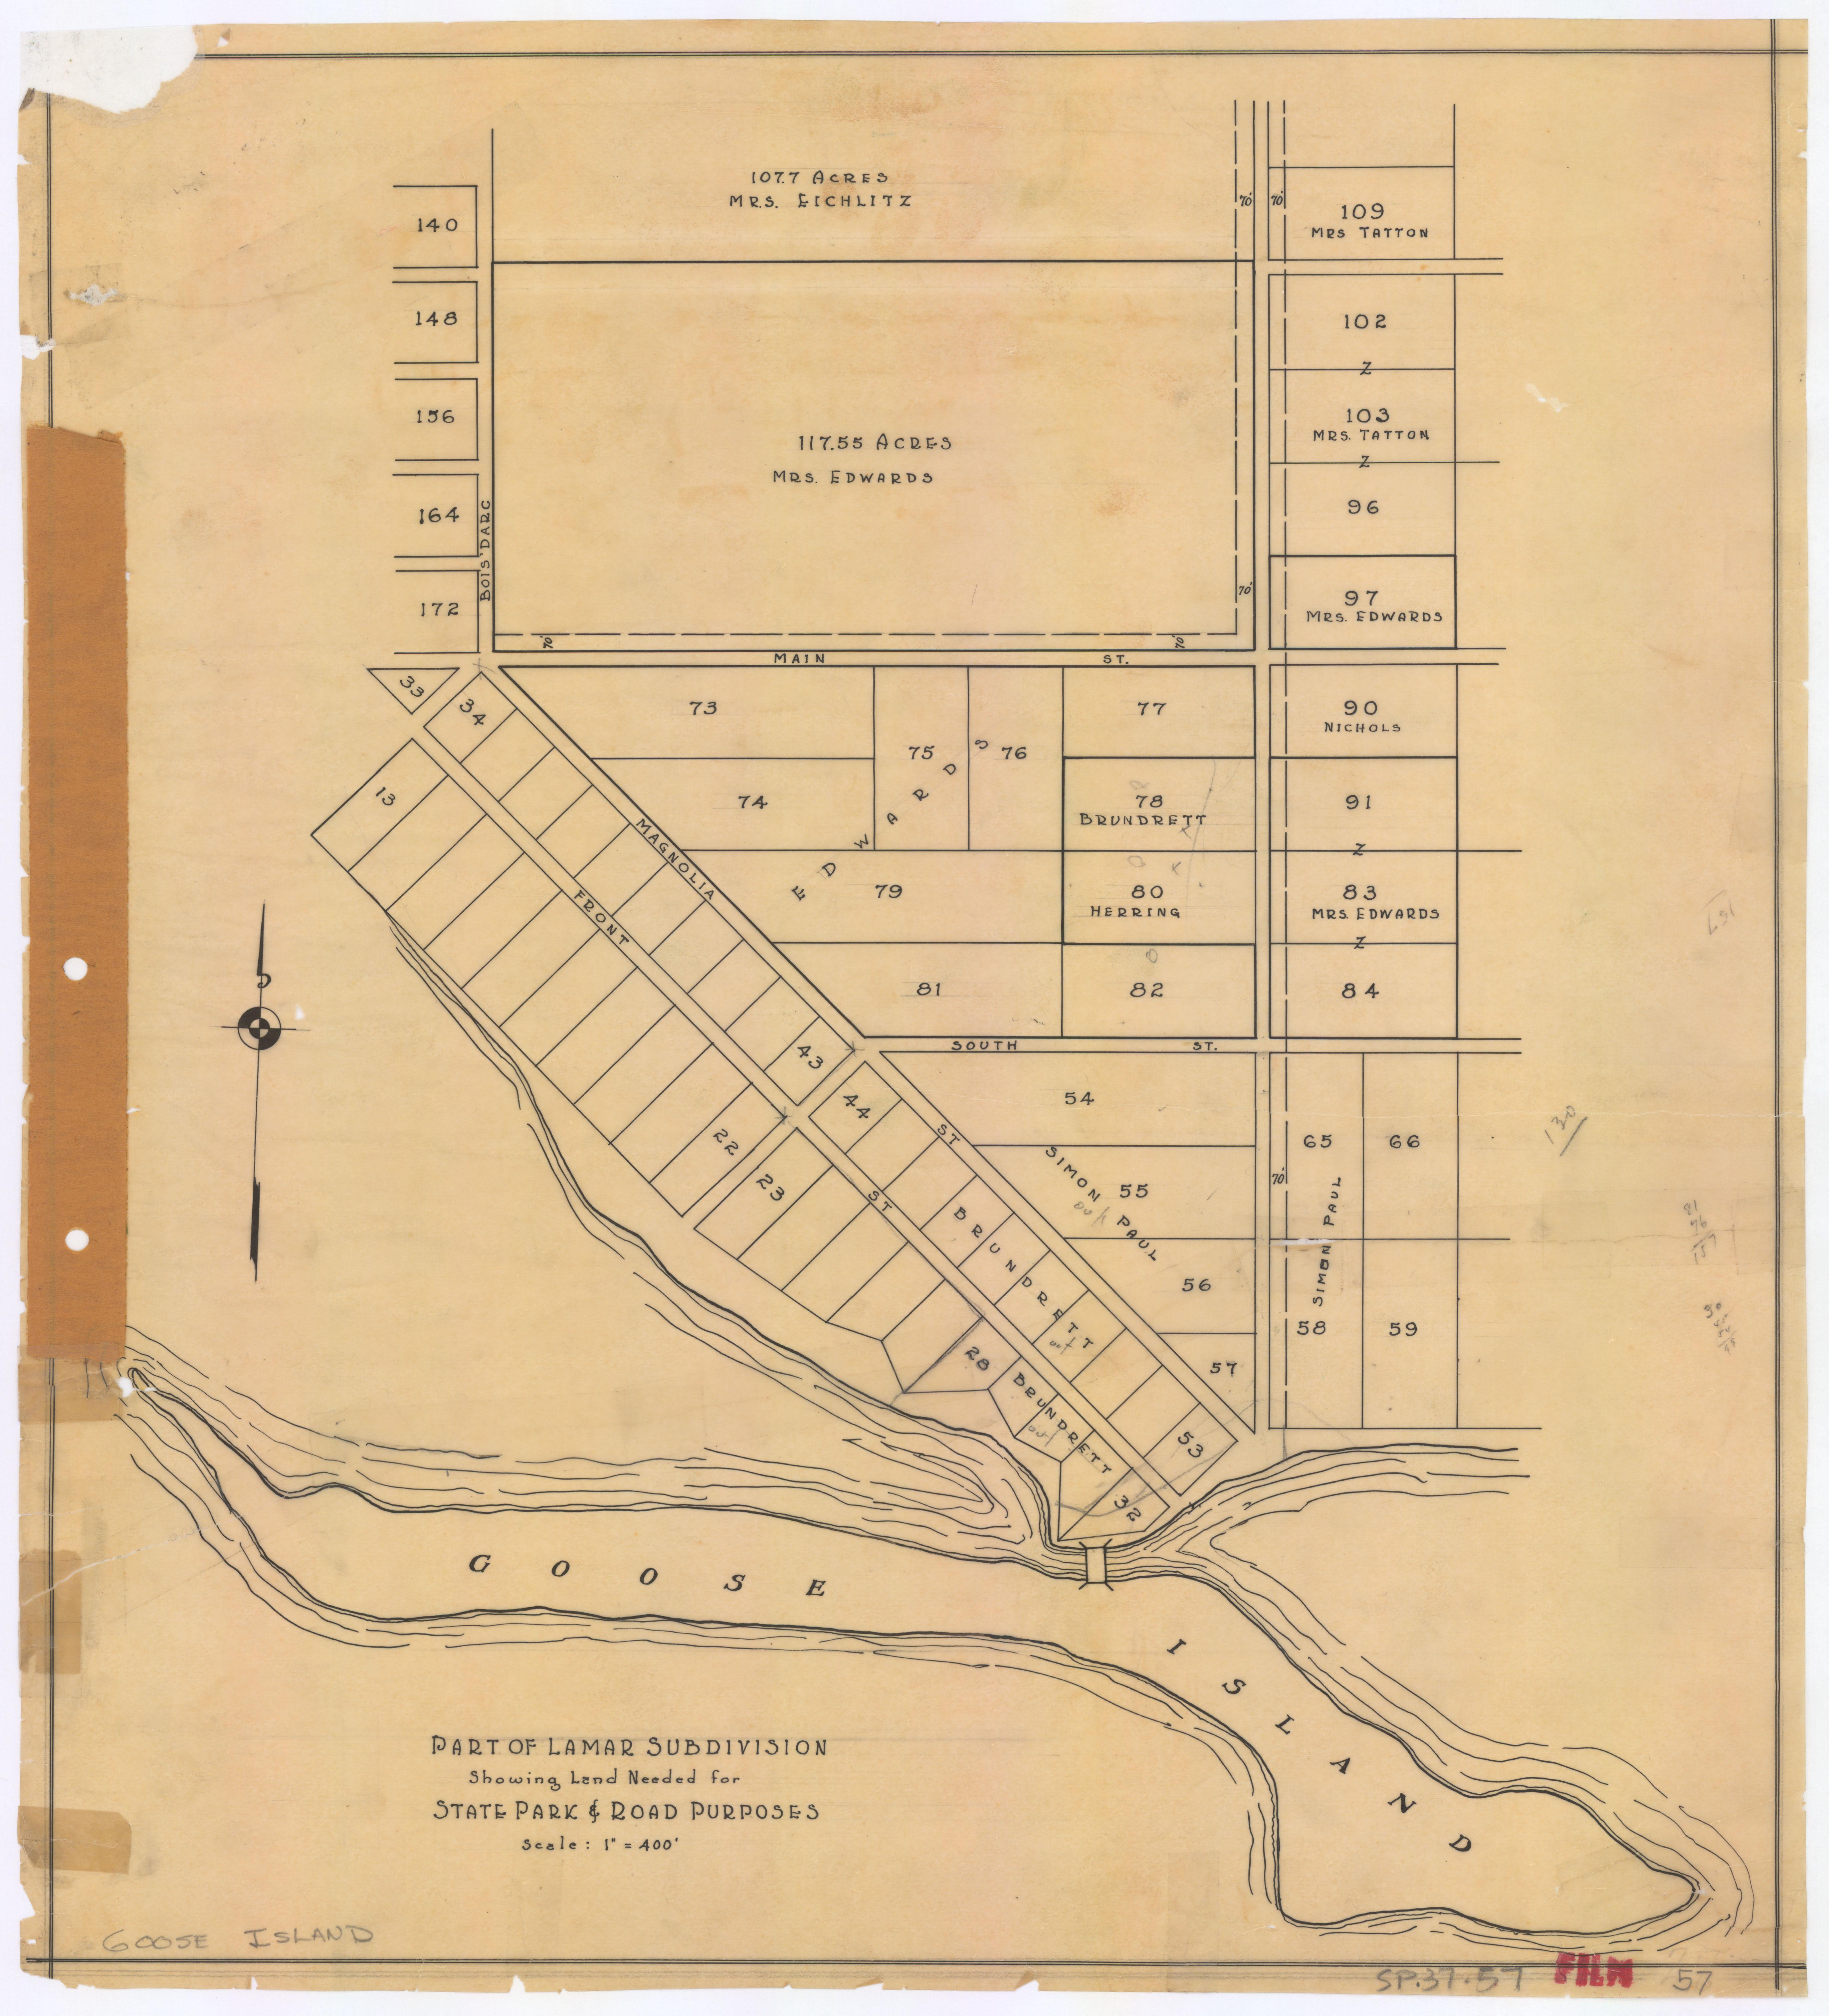 Goose Island State Park - Part of Lamar Subdivision - SP.37.57